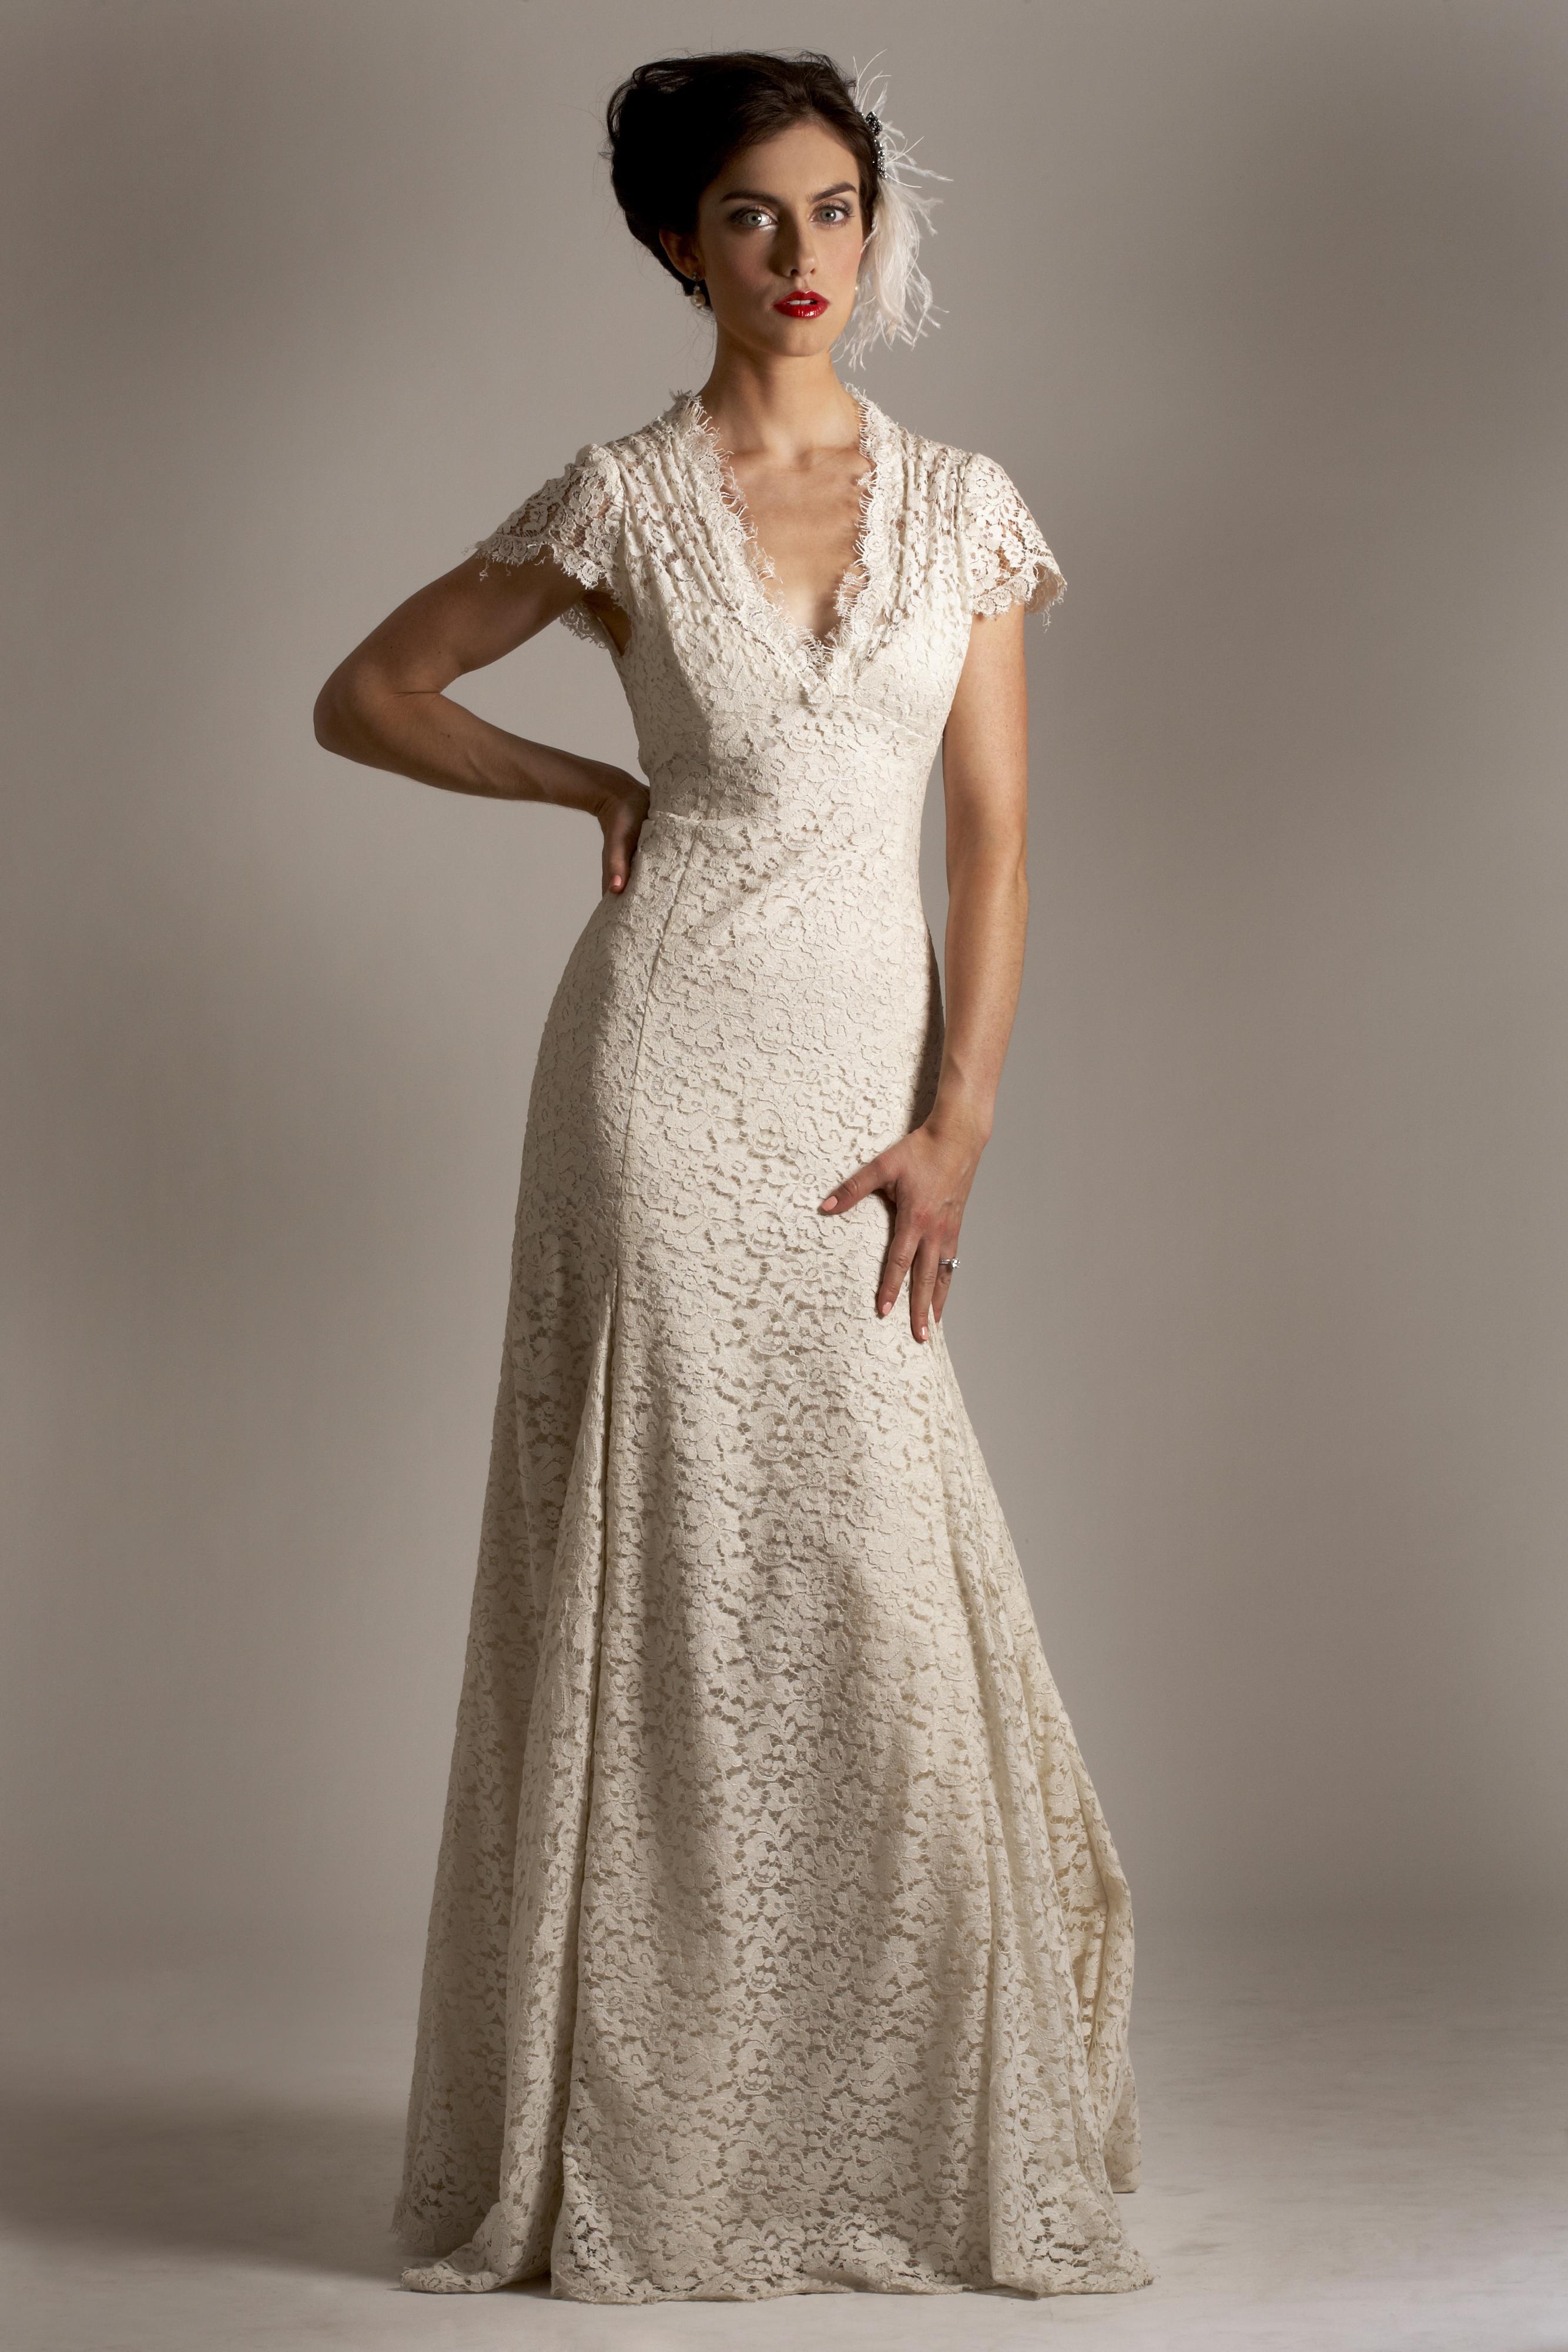 wedding dresses for older brides second weddings photo - 1